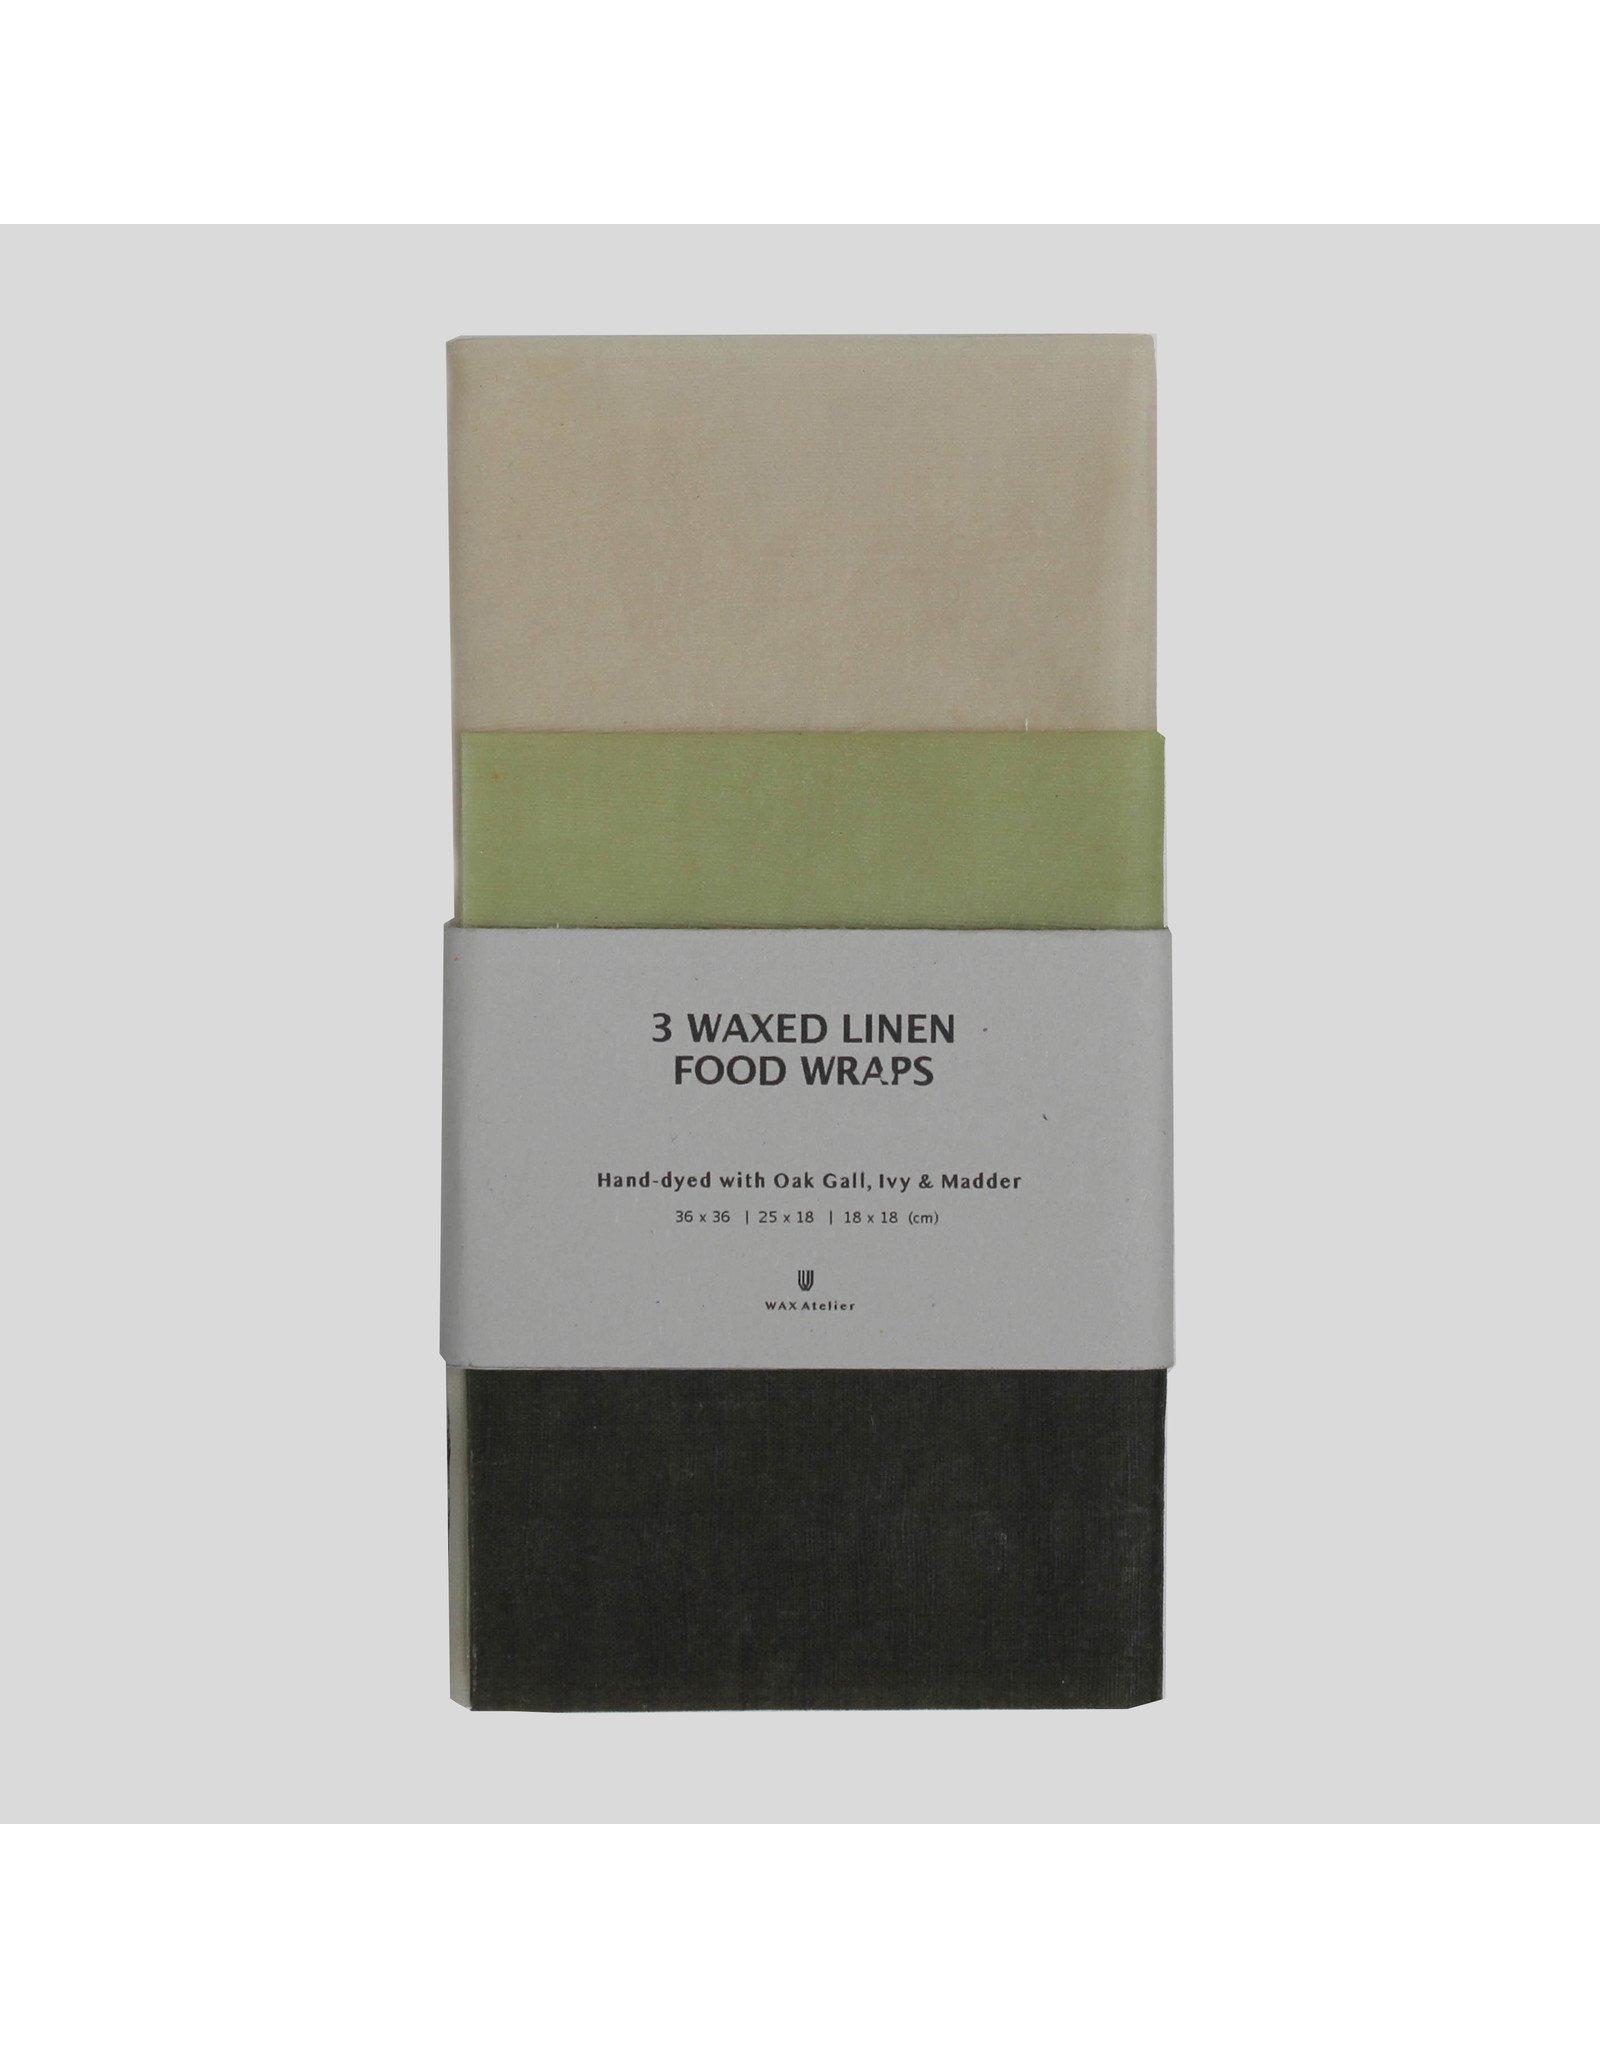 Wax Linen Food Wraps 3 Pack